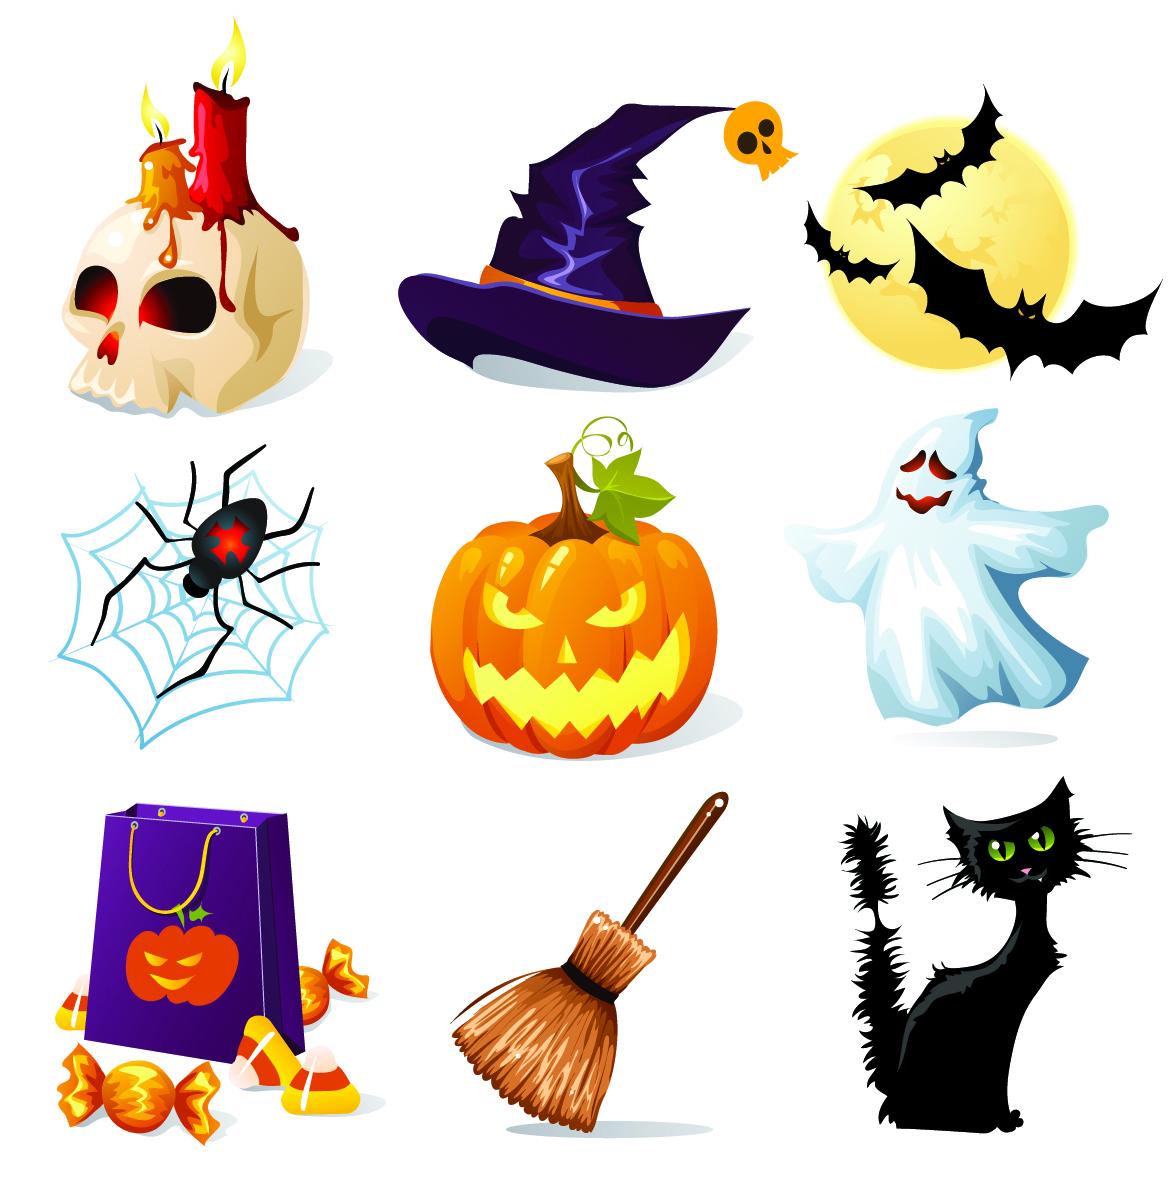 free vector halloween clipart - photo #37